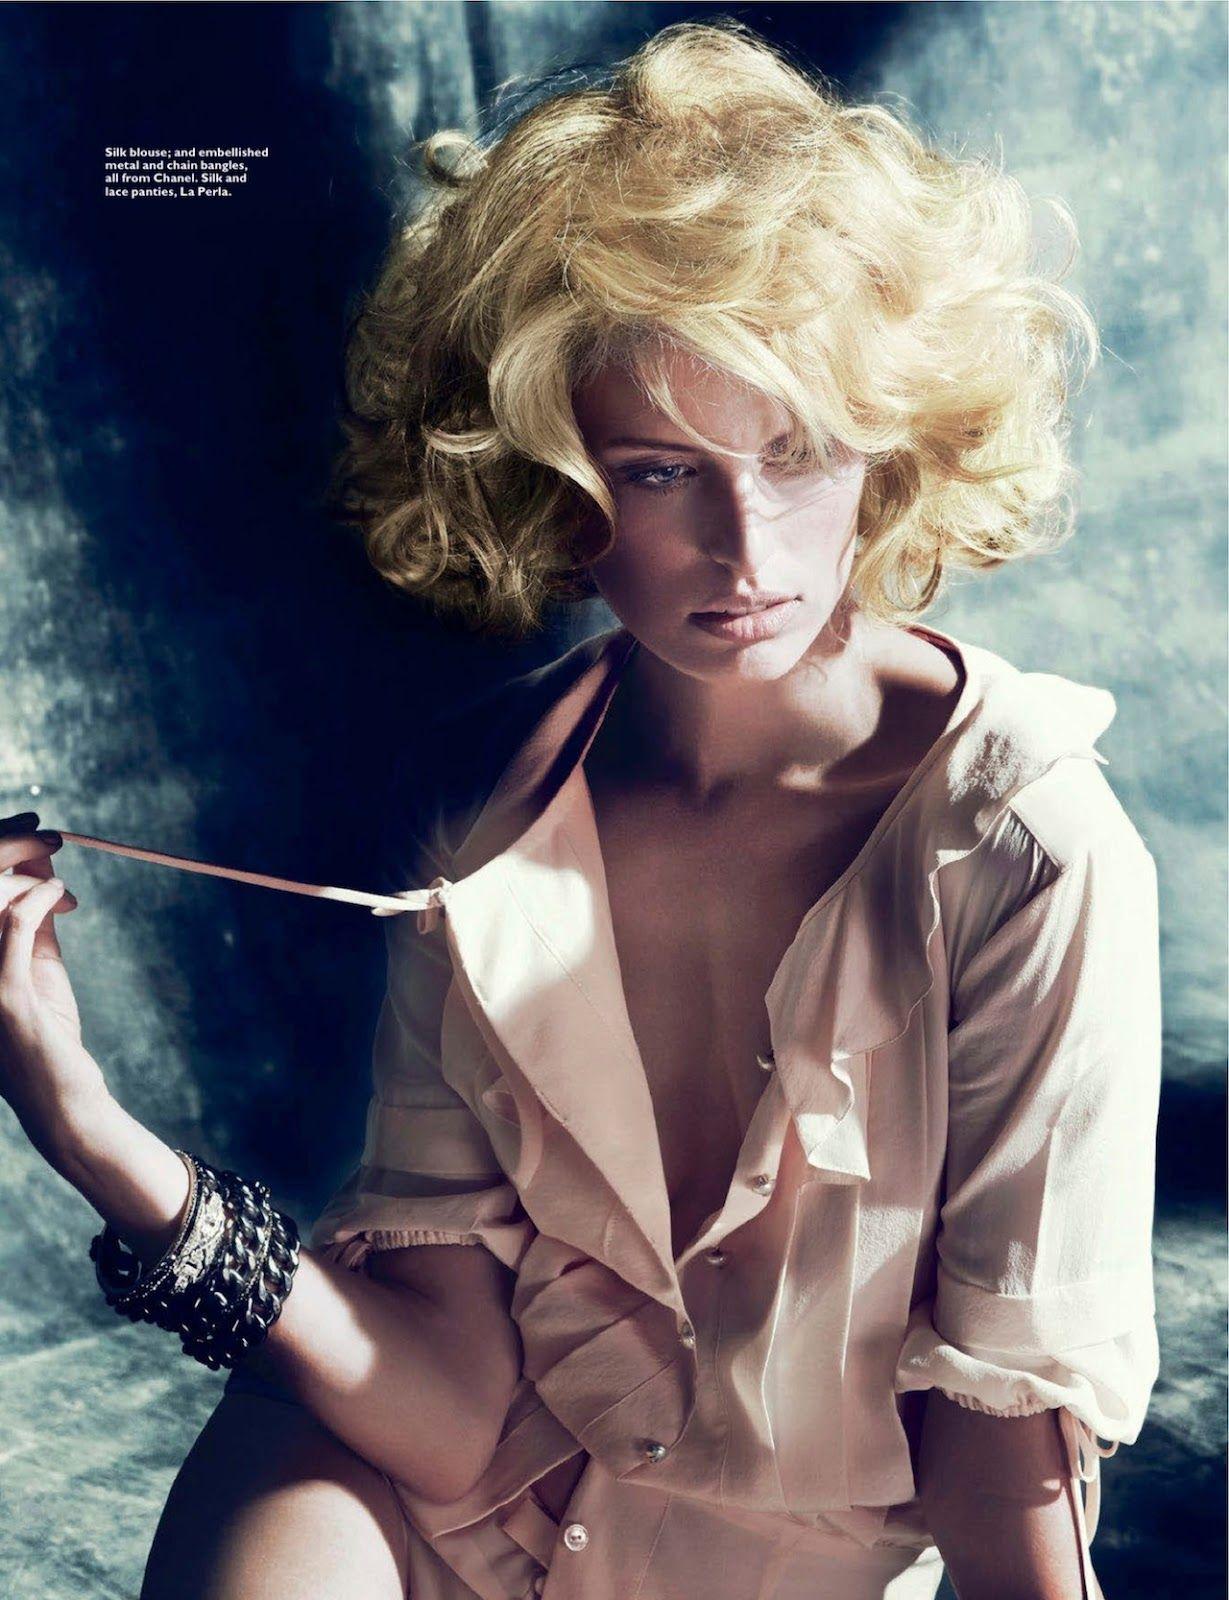 , Chanel Spring Summer 2014 Editorial, Hot Models Blog 2020, Hot Models Blog 2020